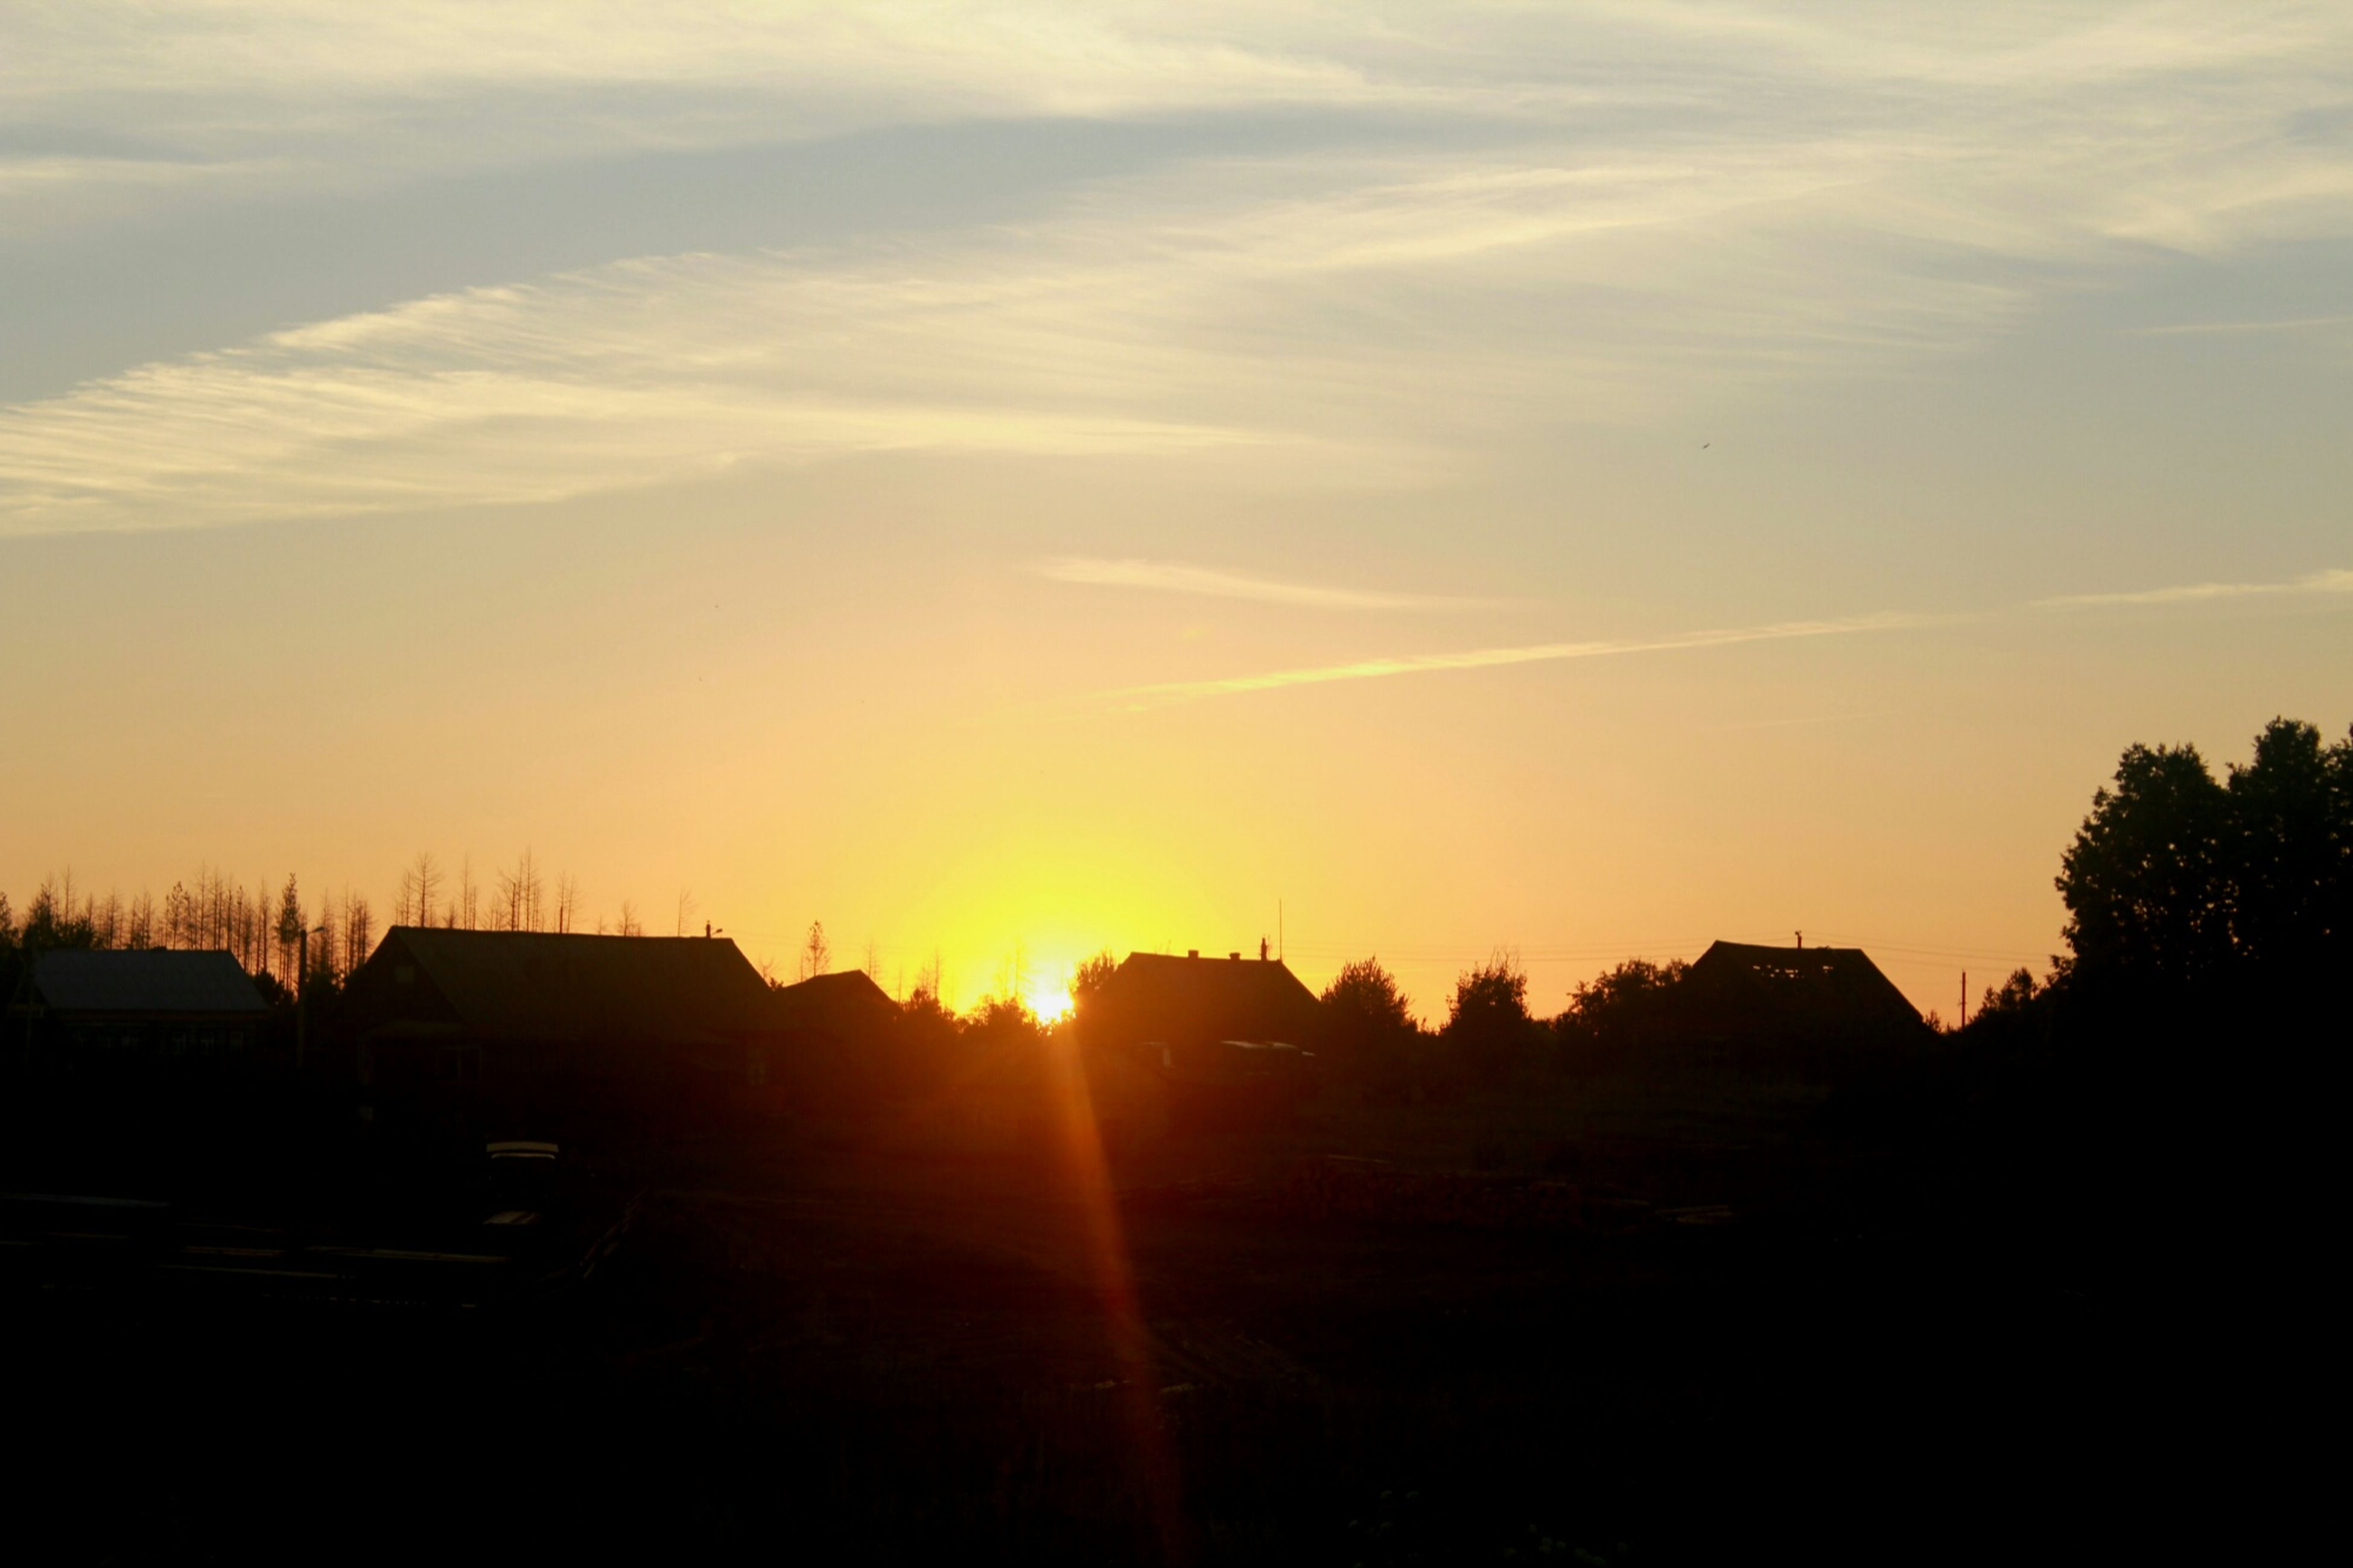 sunset, sun, silhouette, building exterior, architecture, built structure, sky, sunlight, sunbeam, tree, house, scenics, beauty in nature, orange color, nature, lens flare, cloud - sky, landscape, tranquil scene, tranquility